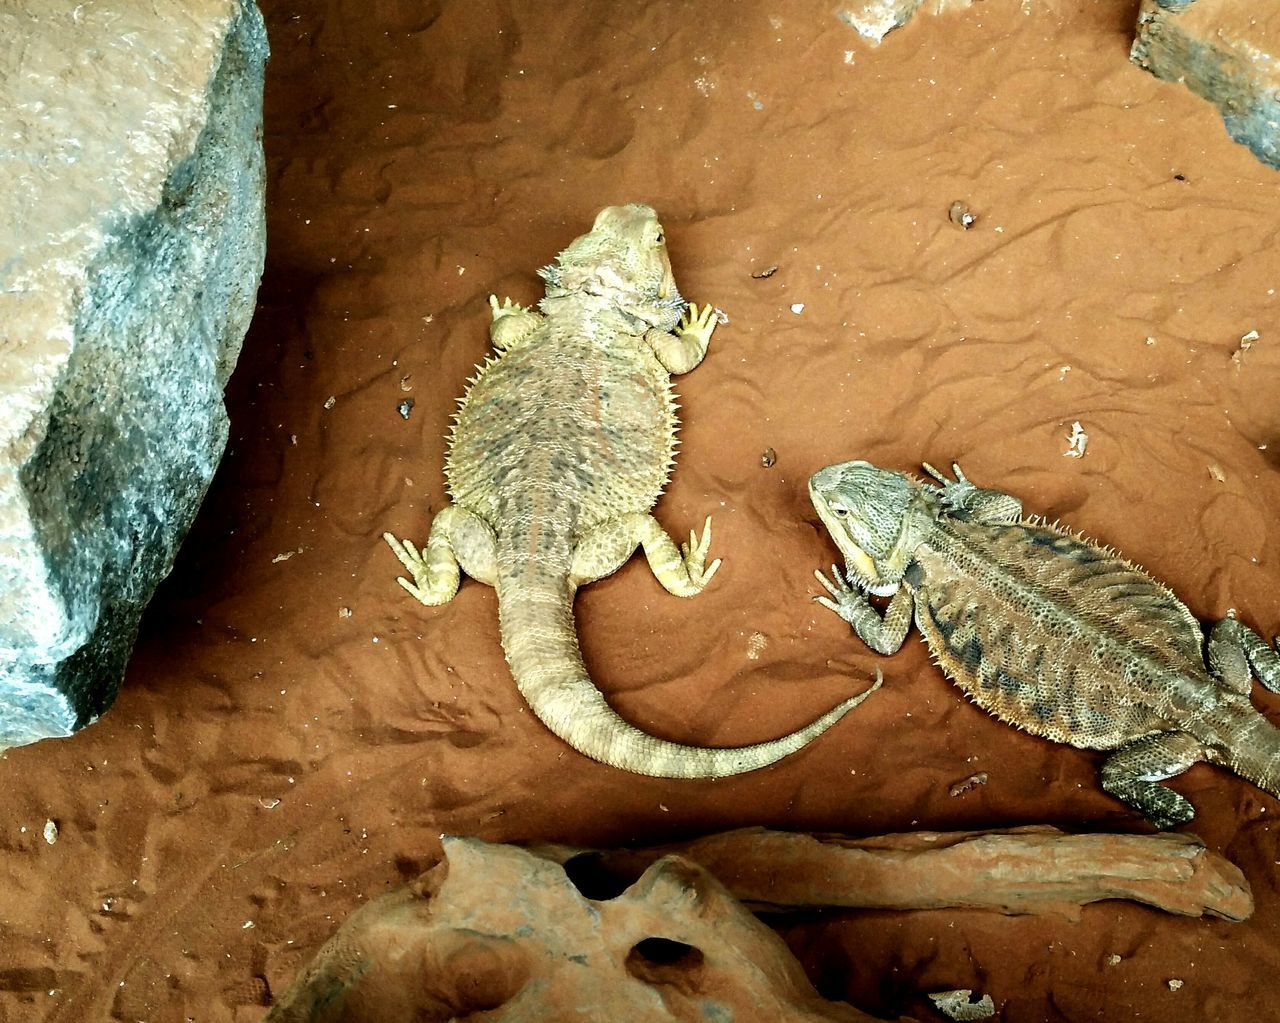 Lizards Animalphotography Animals Animal Wildlife Animals In The Wild Animal Lizard Cuteness Lizard Photography Lizard Nature Lizards Lizard